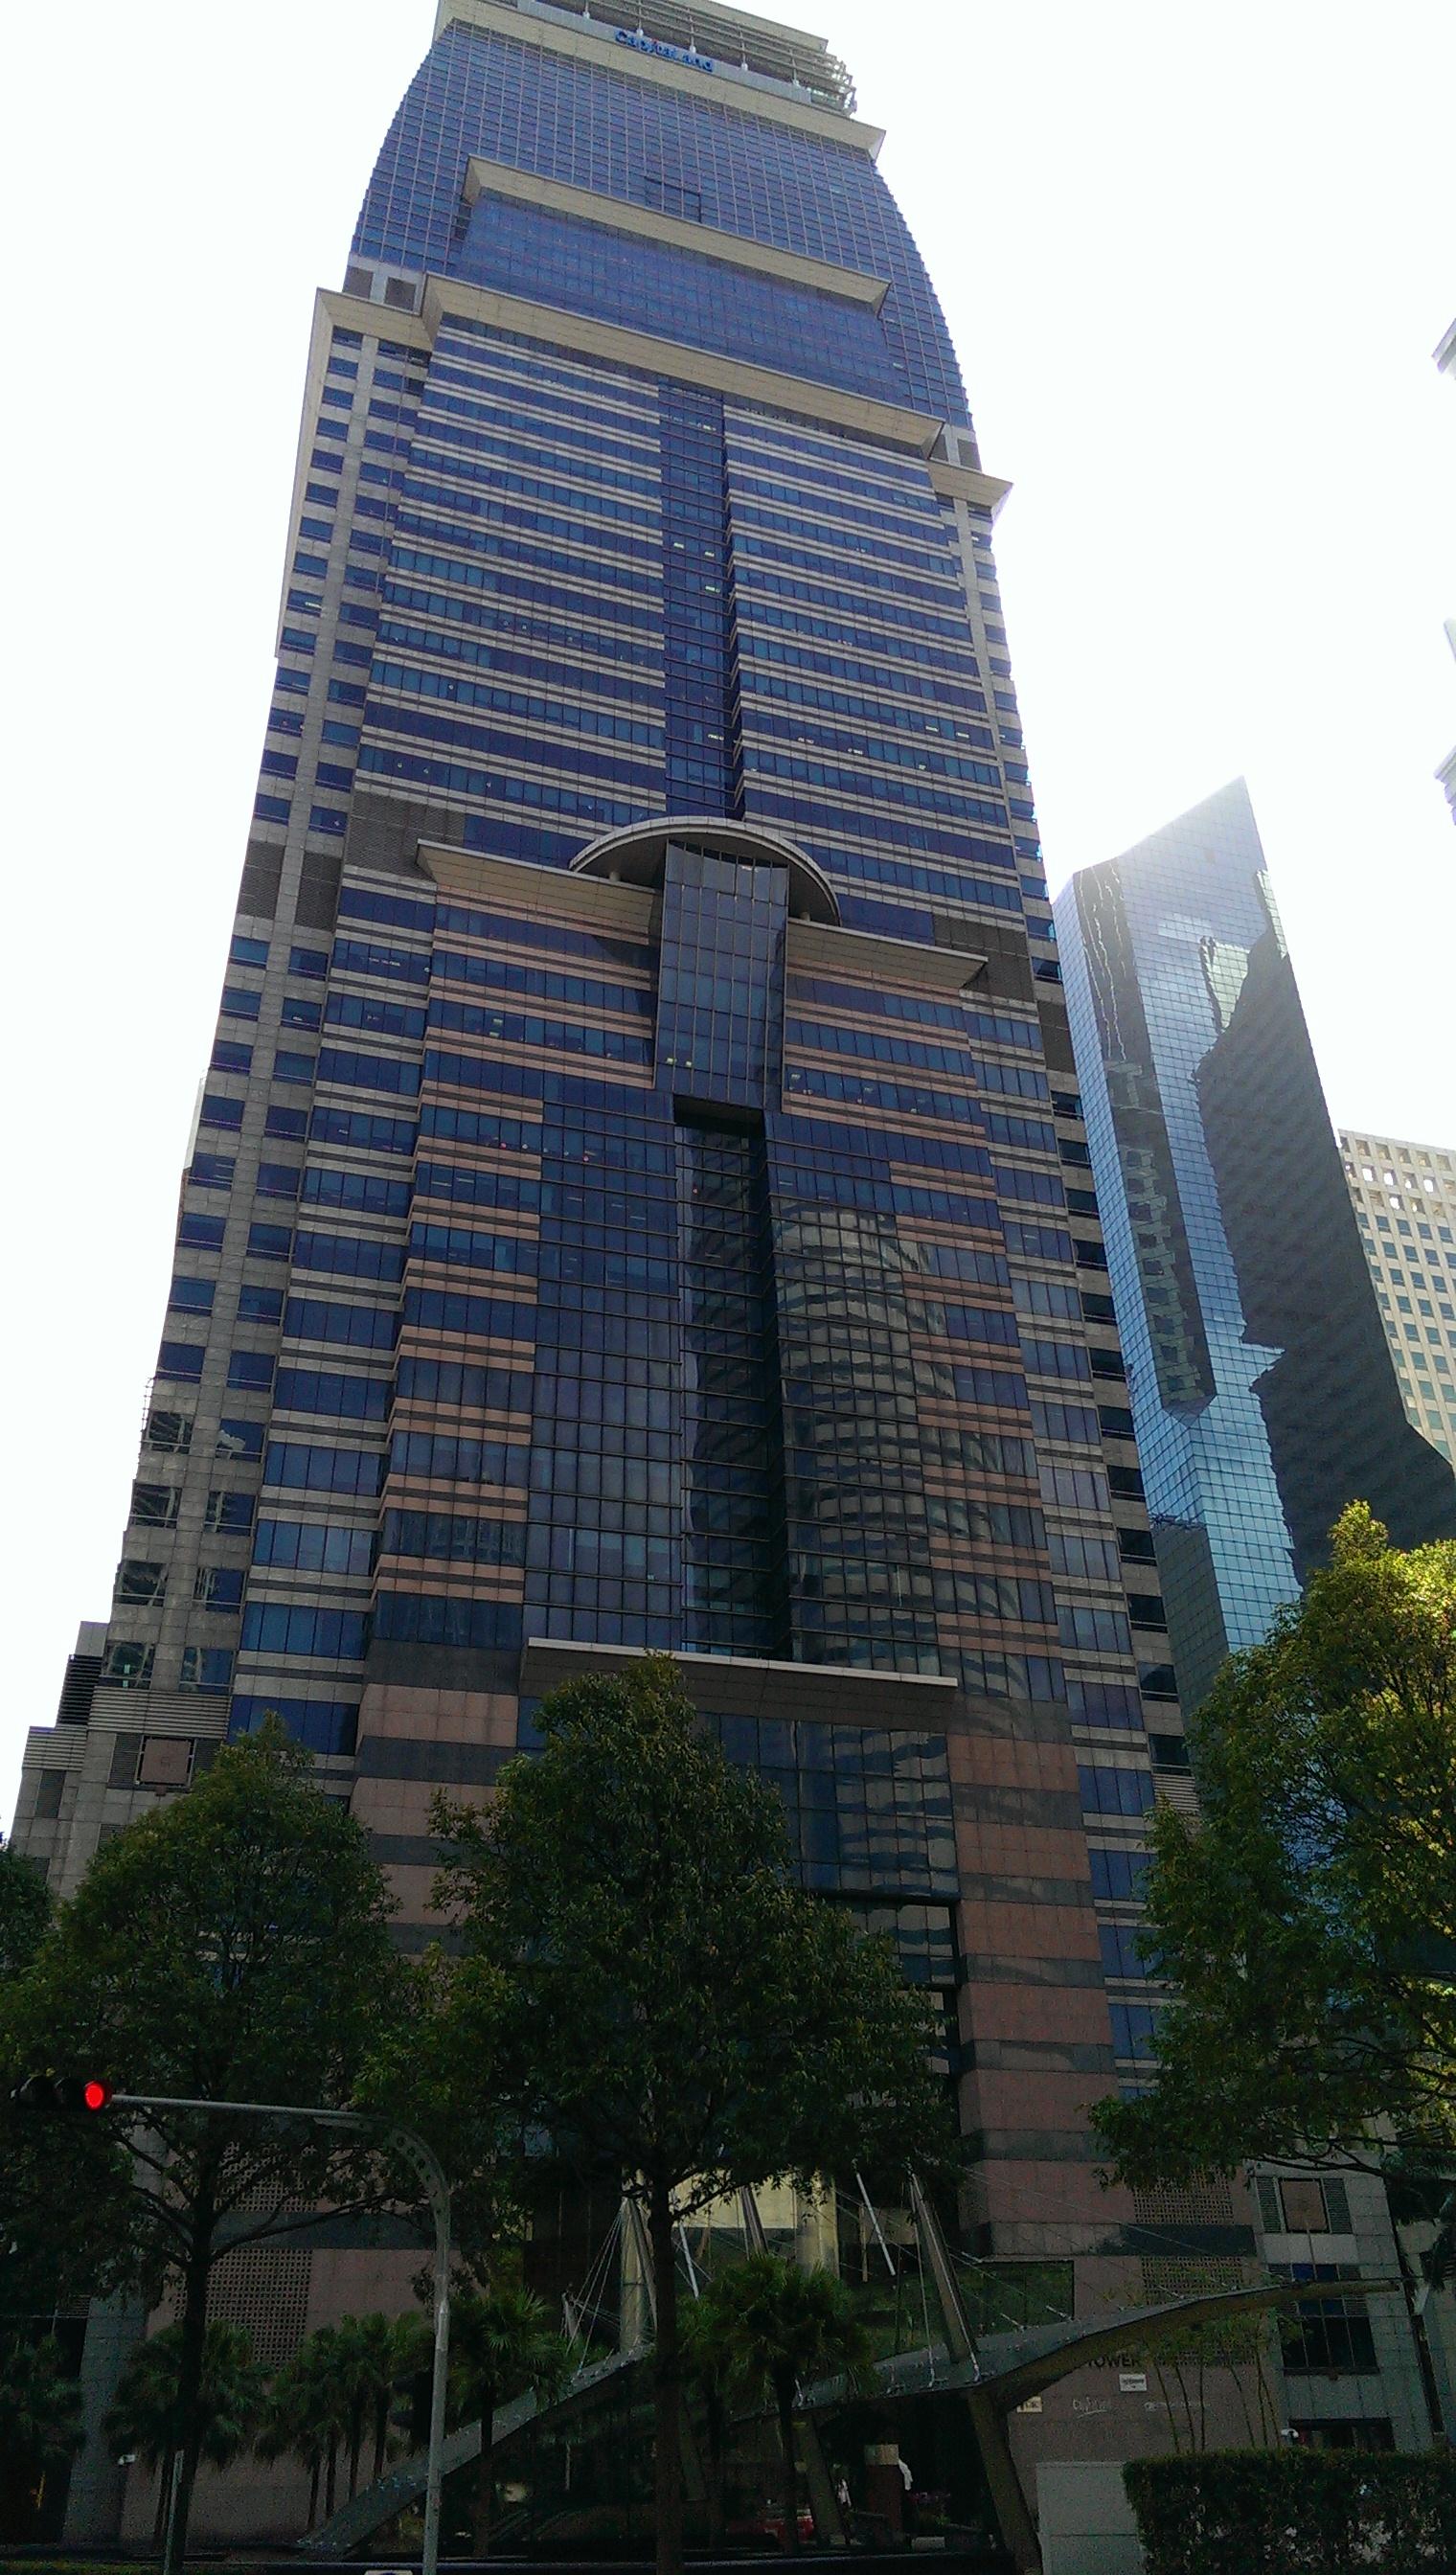 Capital Tower - SSgA Offices on 33rd Floor